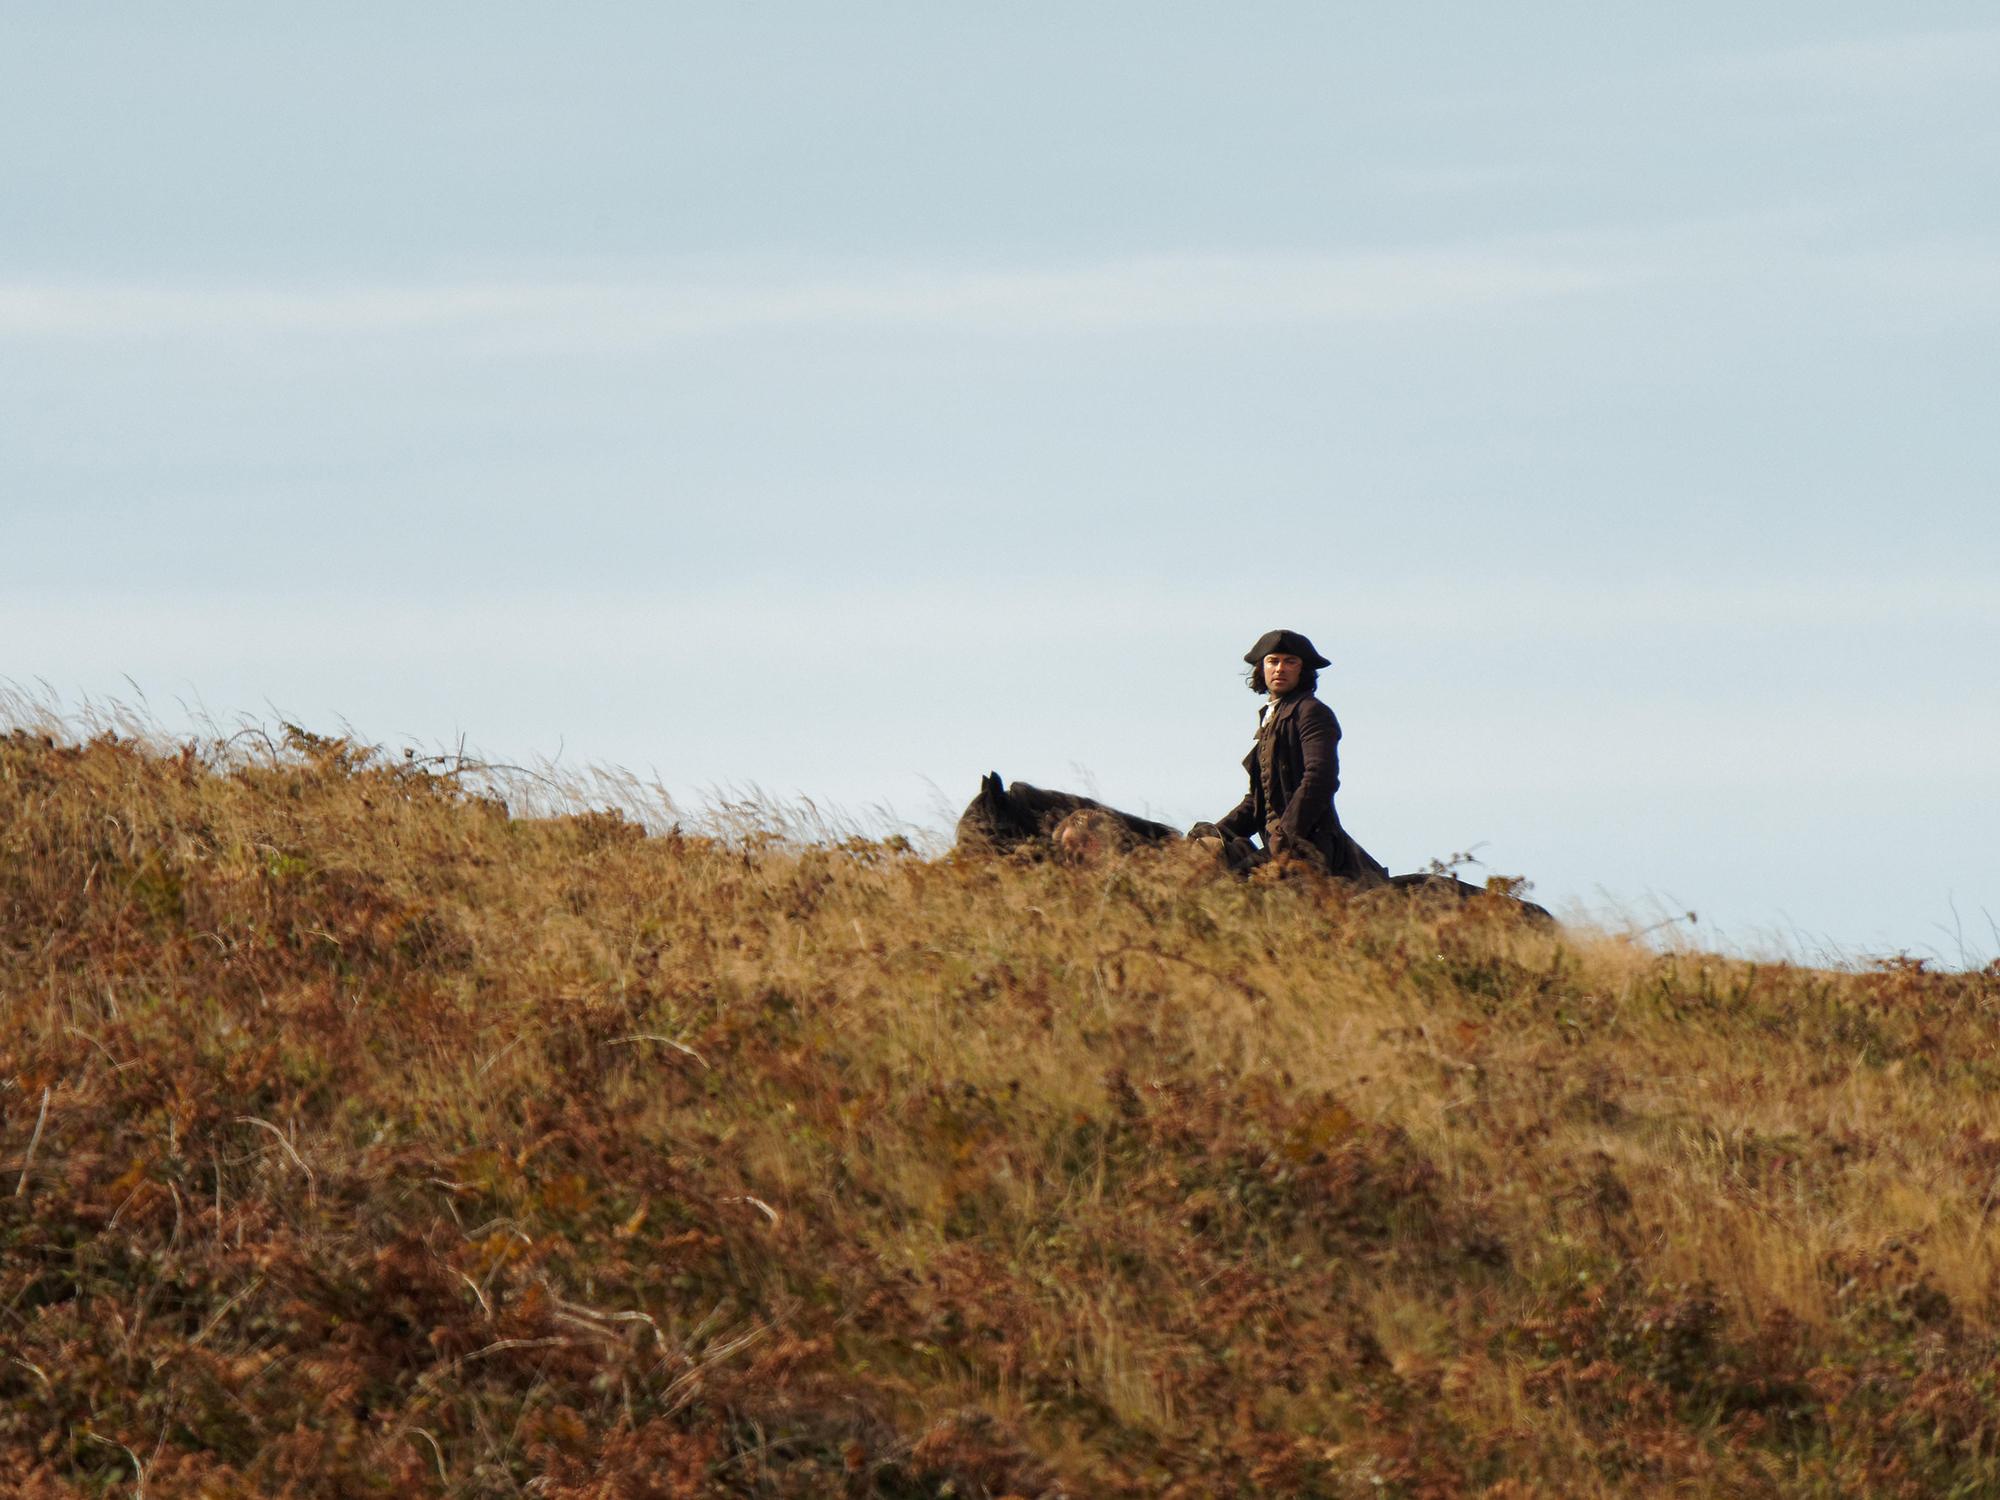 Cornwall - poldark filming locations